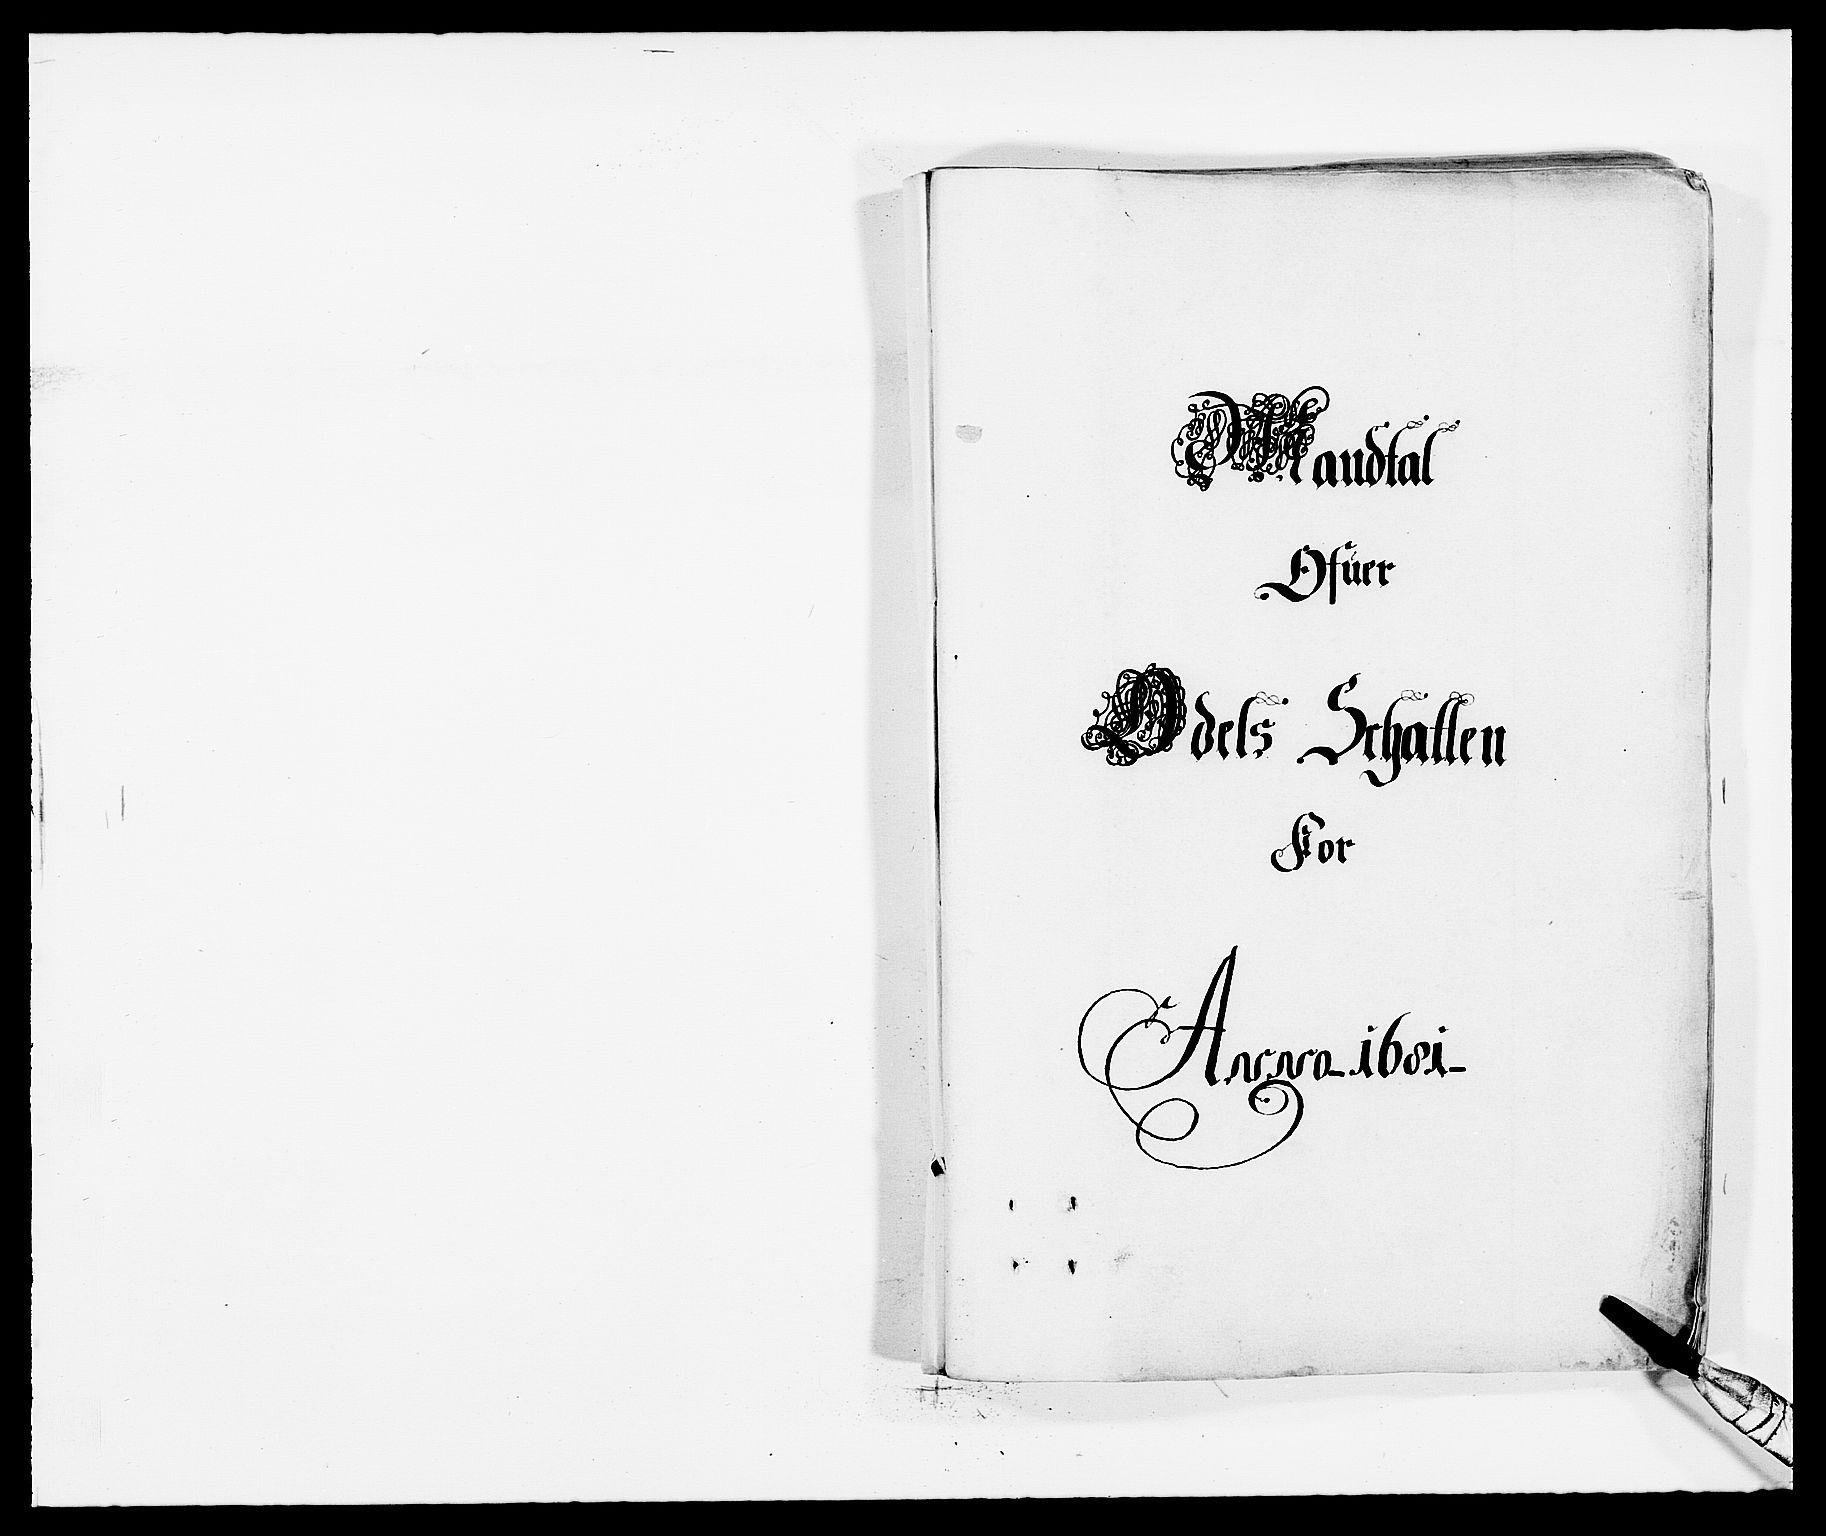 RA, Rentekammeret inntil 1814, Reviderte regnskaper, Fogderegnskap, R32/L1850: Fogderegnskap Jarlsberg grevskap, 1681, s. 213